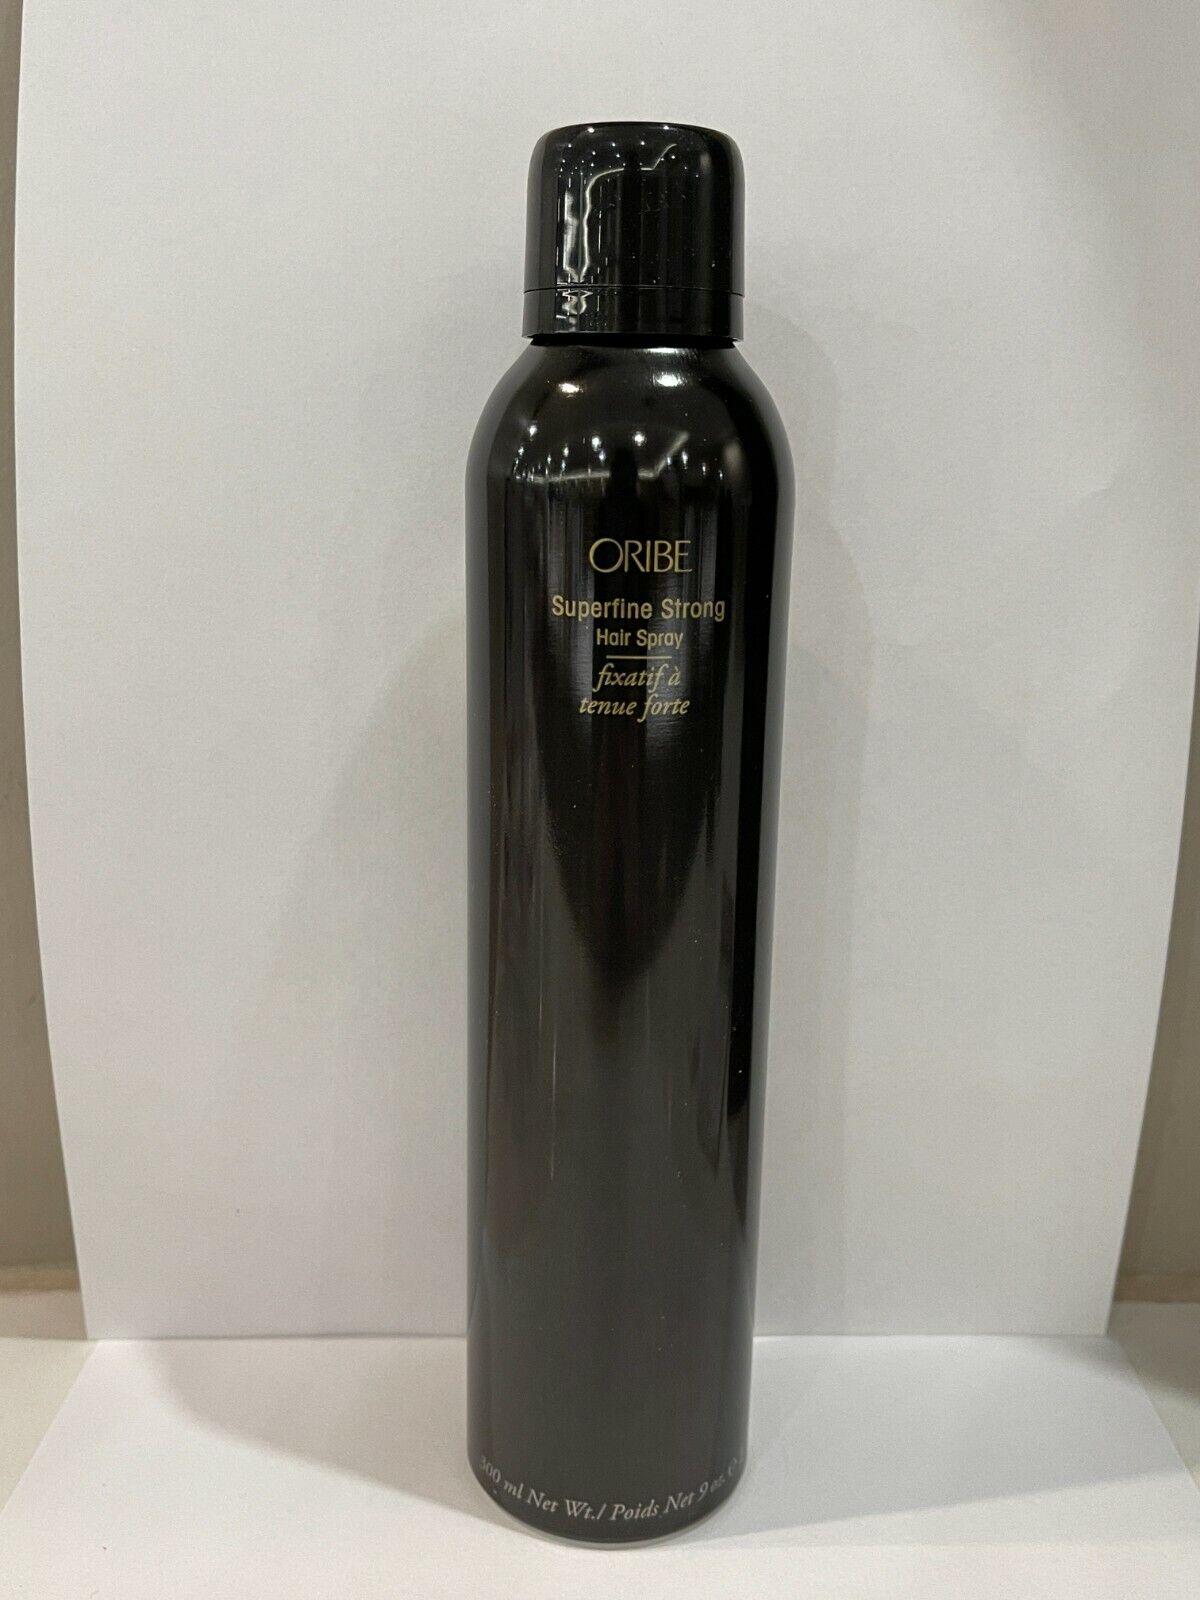 Oribe Superfine Strong  Hair Spray 9.0 oz/ 300 ml[BRAND NEW}